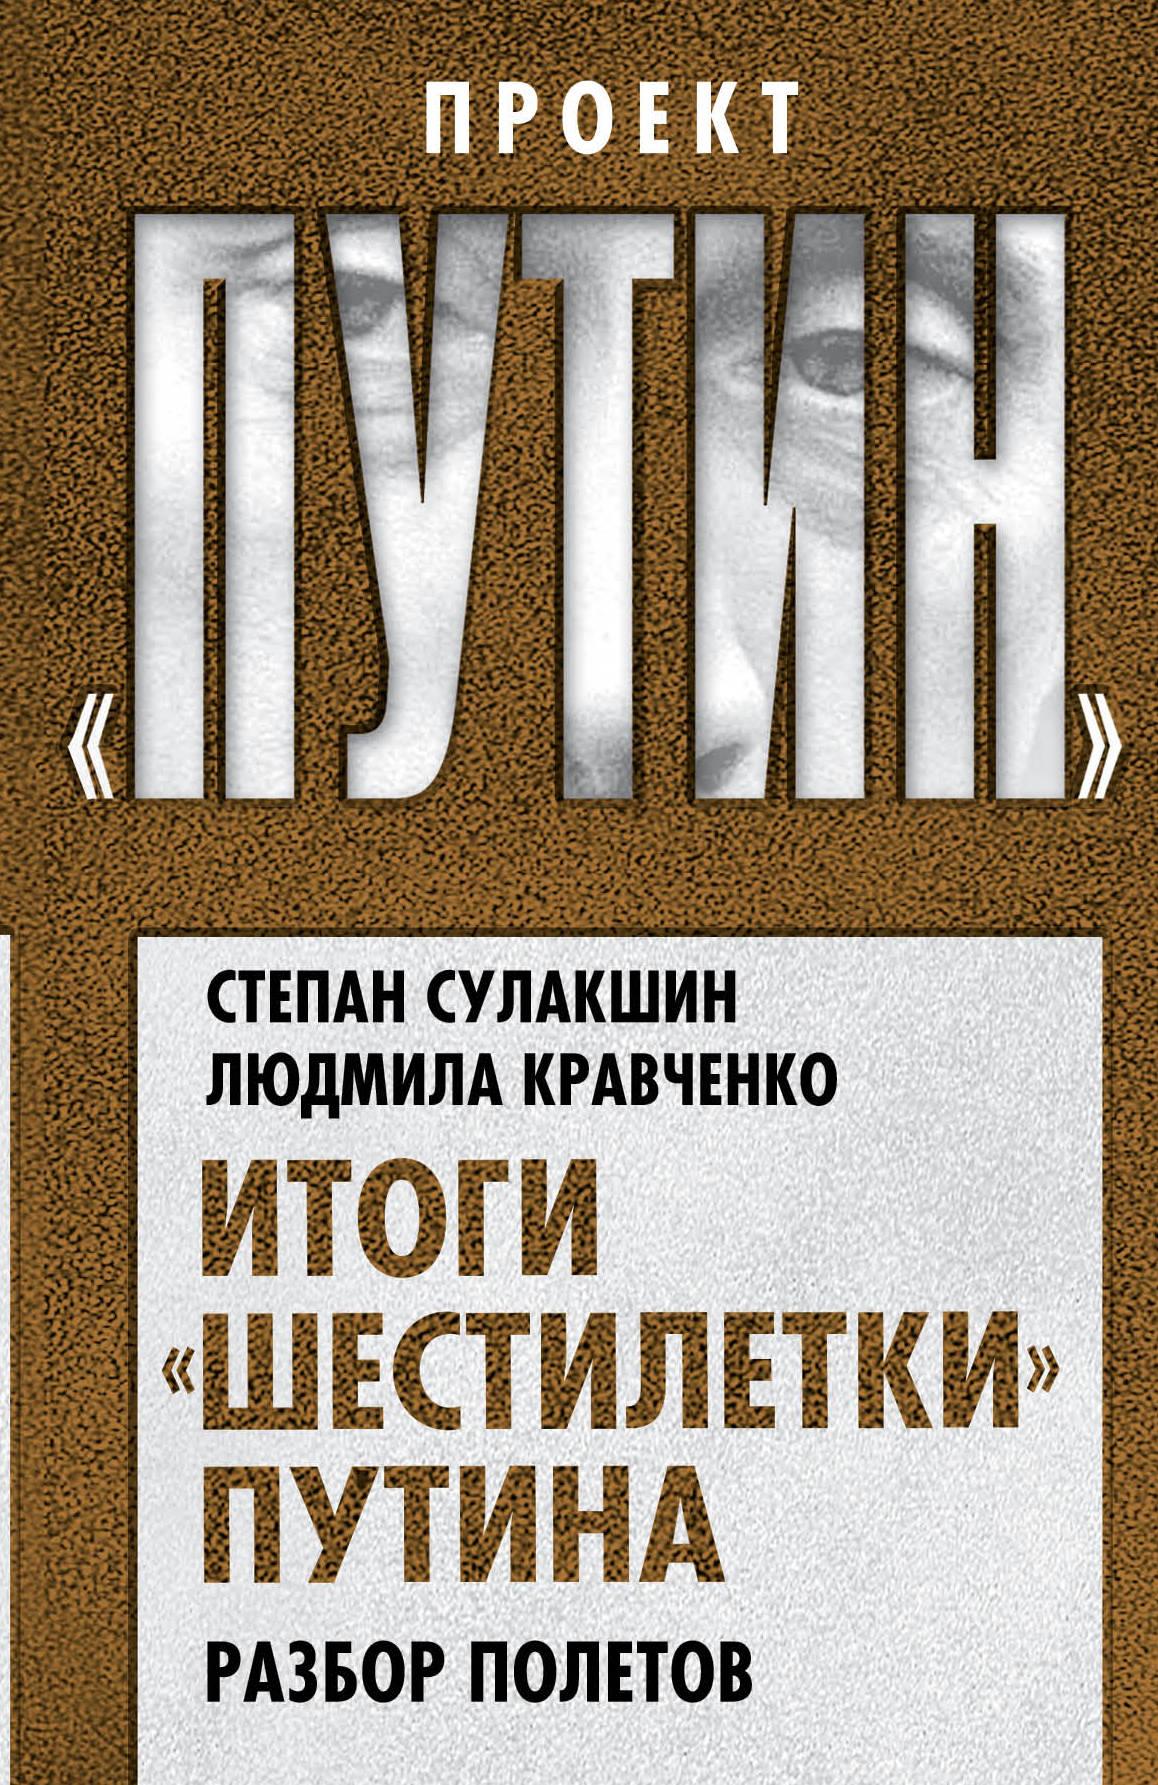 Степан Сулакшин, Людмила Кравченко Итоги шестилетки Путина. Разбор полетов